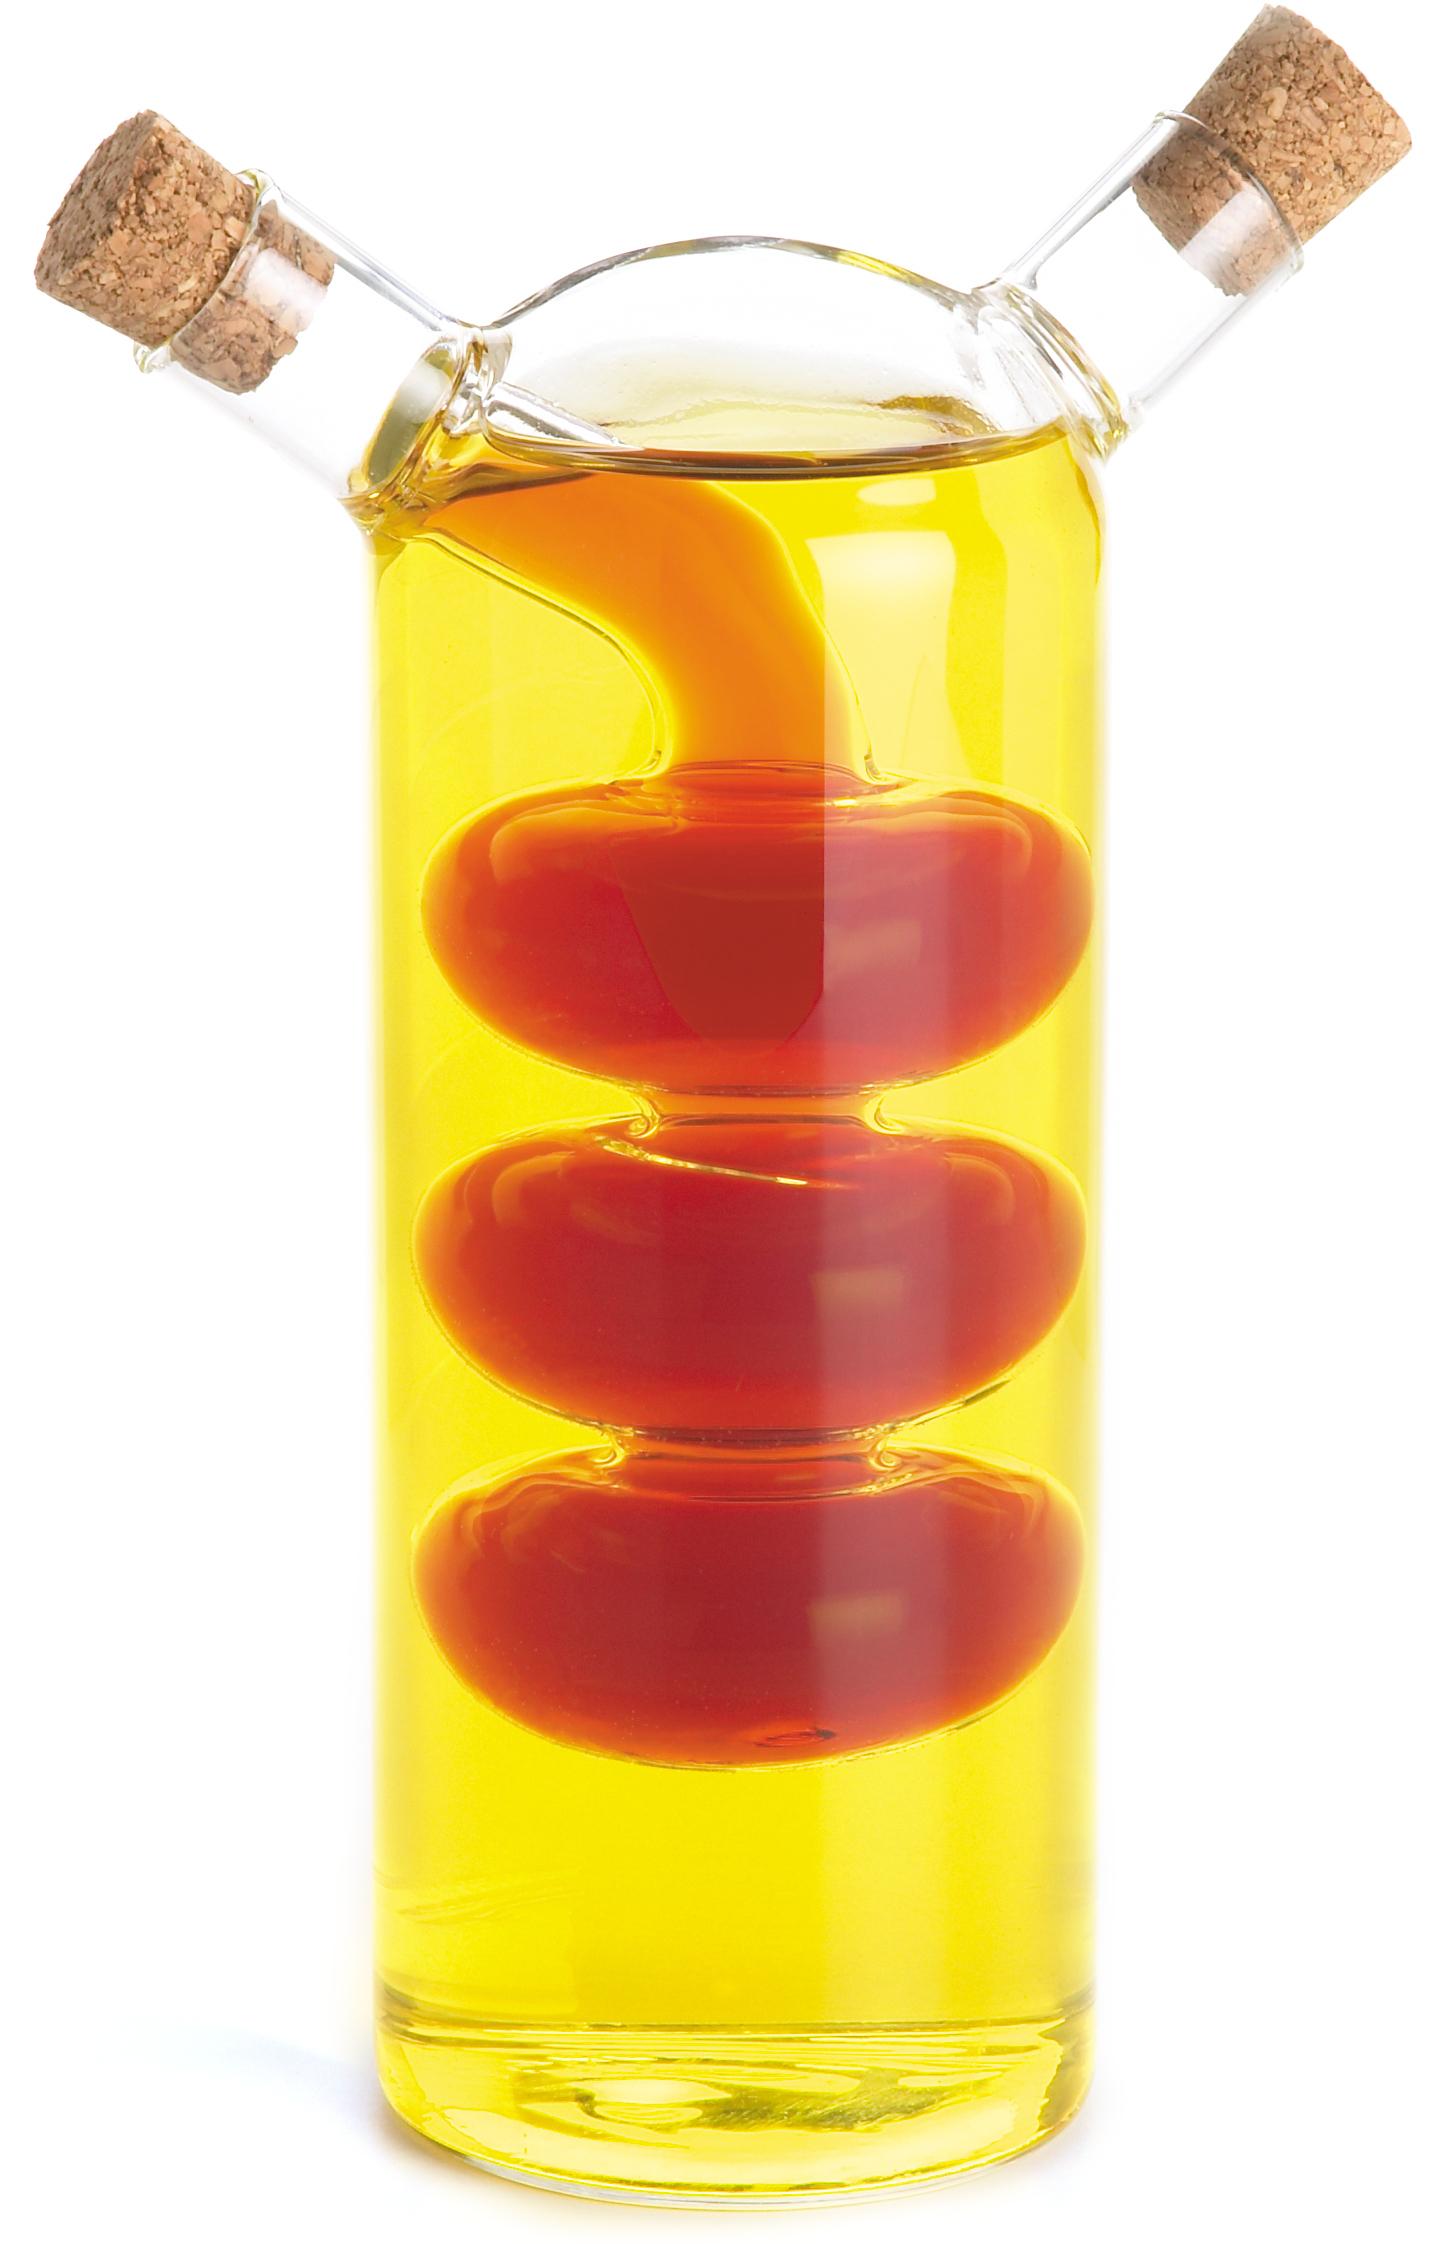 Fox Run 2-in-1 Glass Bubbles Oil and Vinegar Bottle, 7 Inch